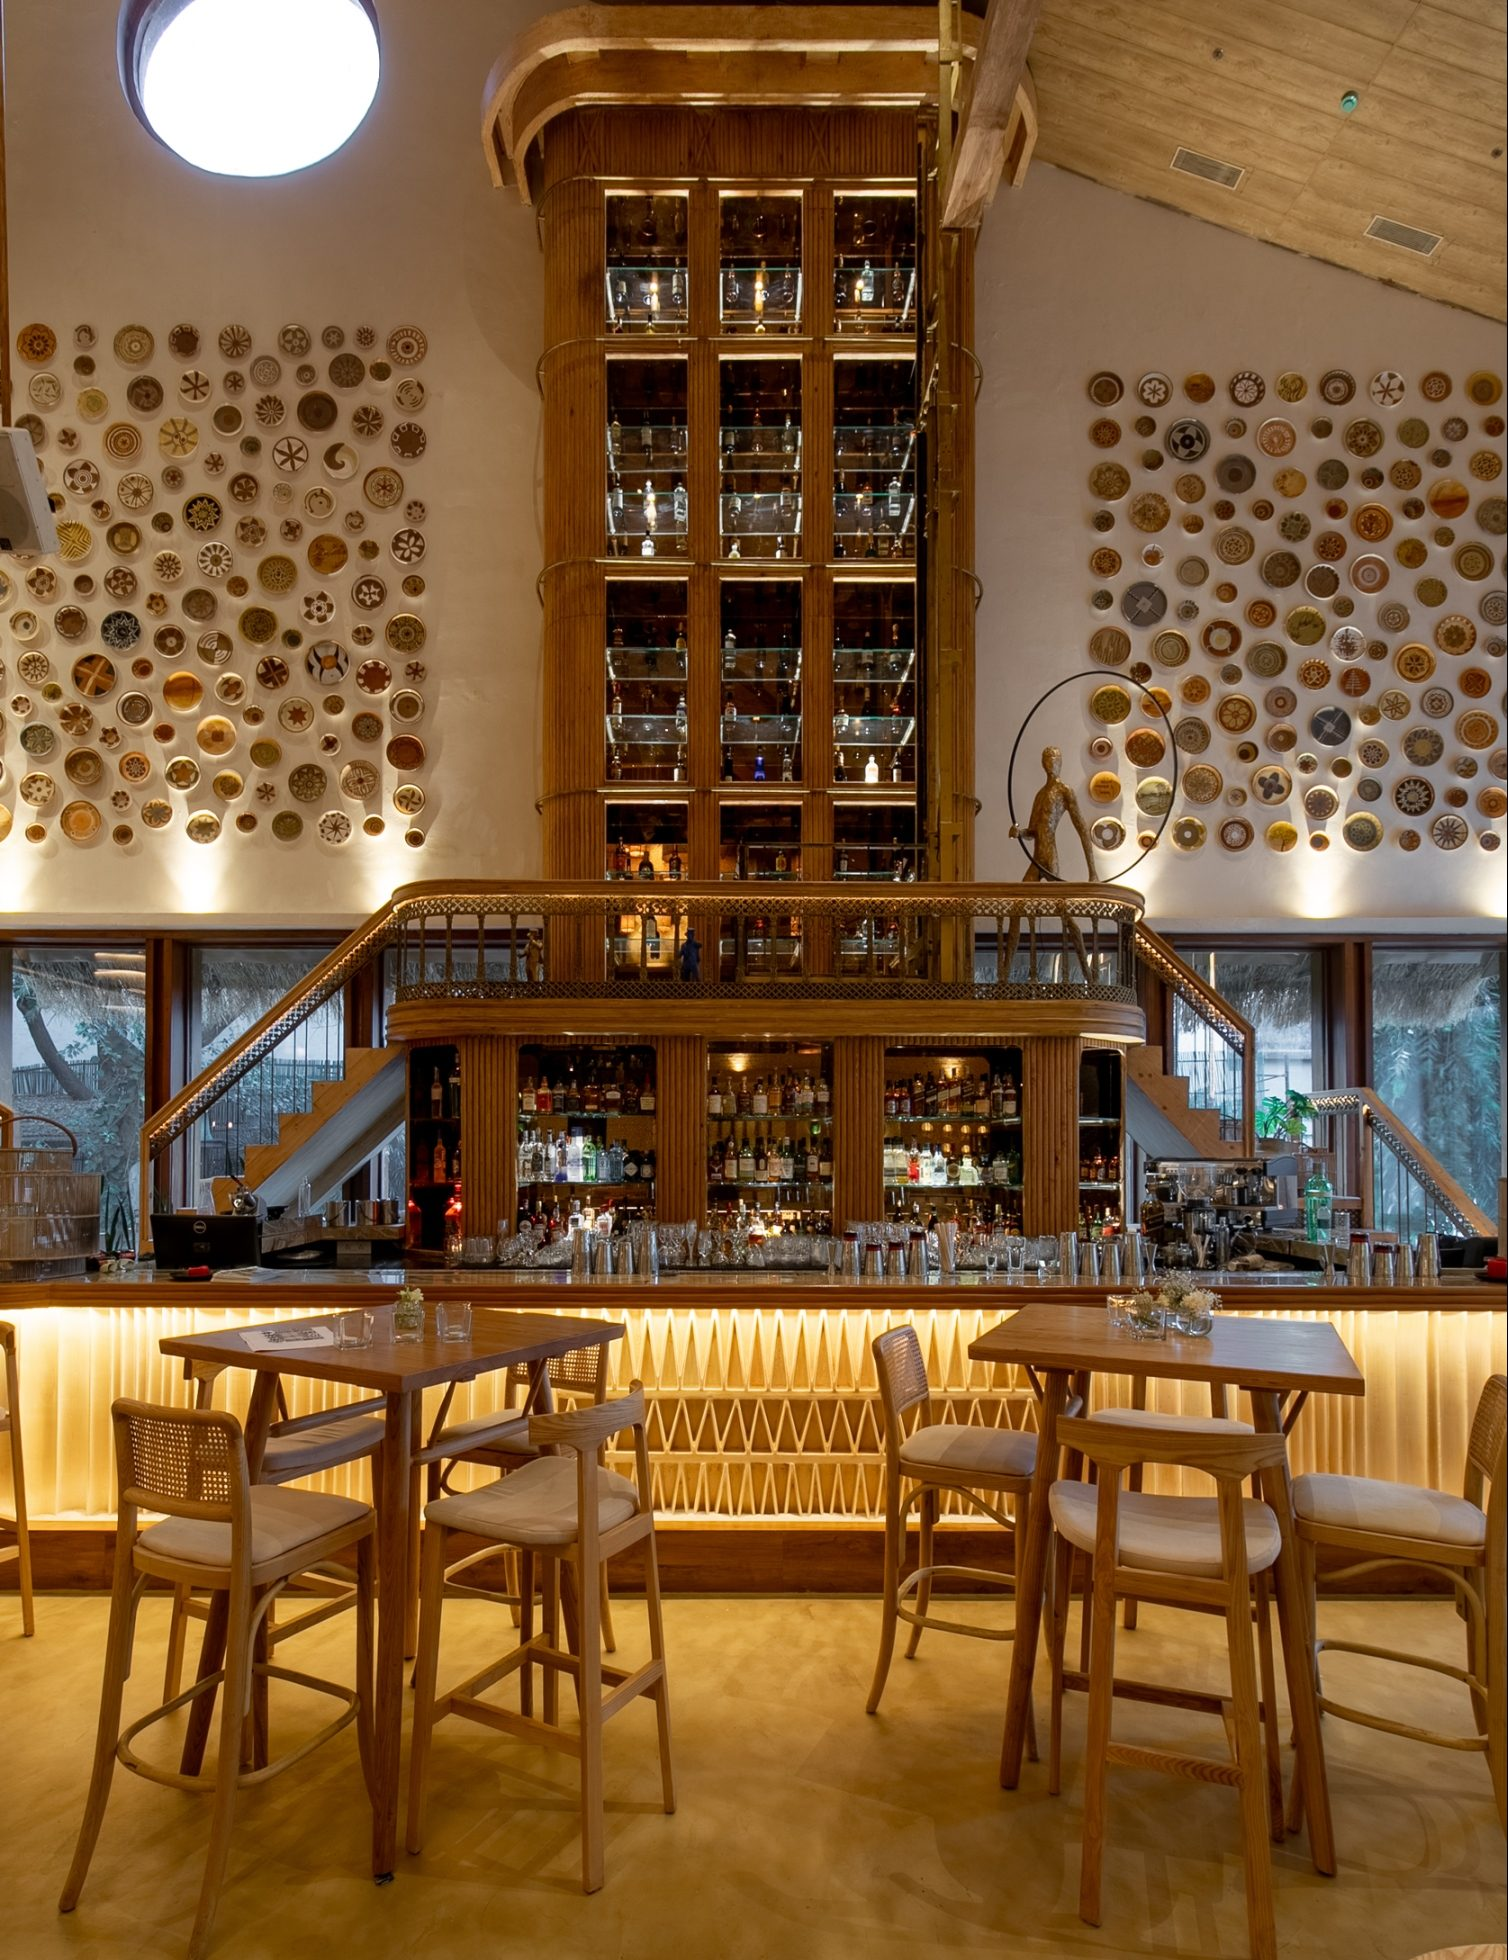 Bastian Worli's 28-Foot Tall Bar